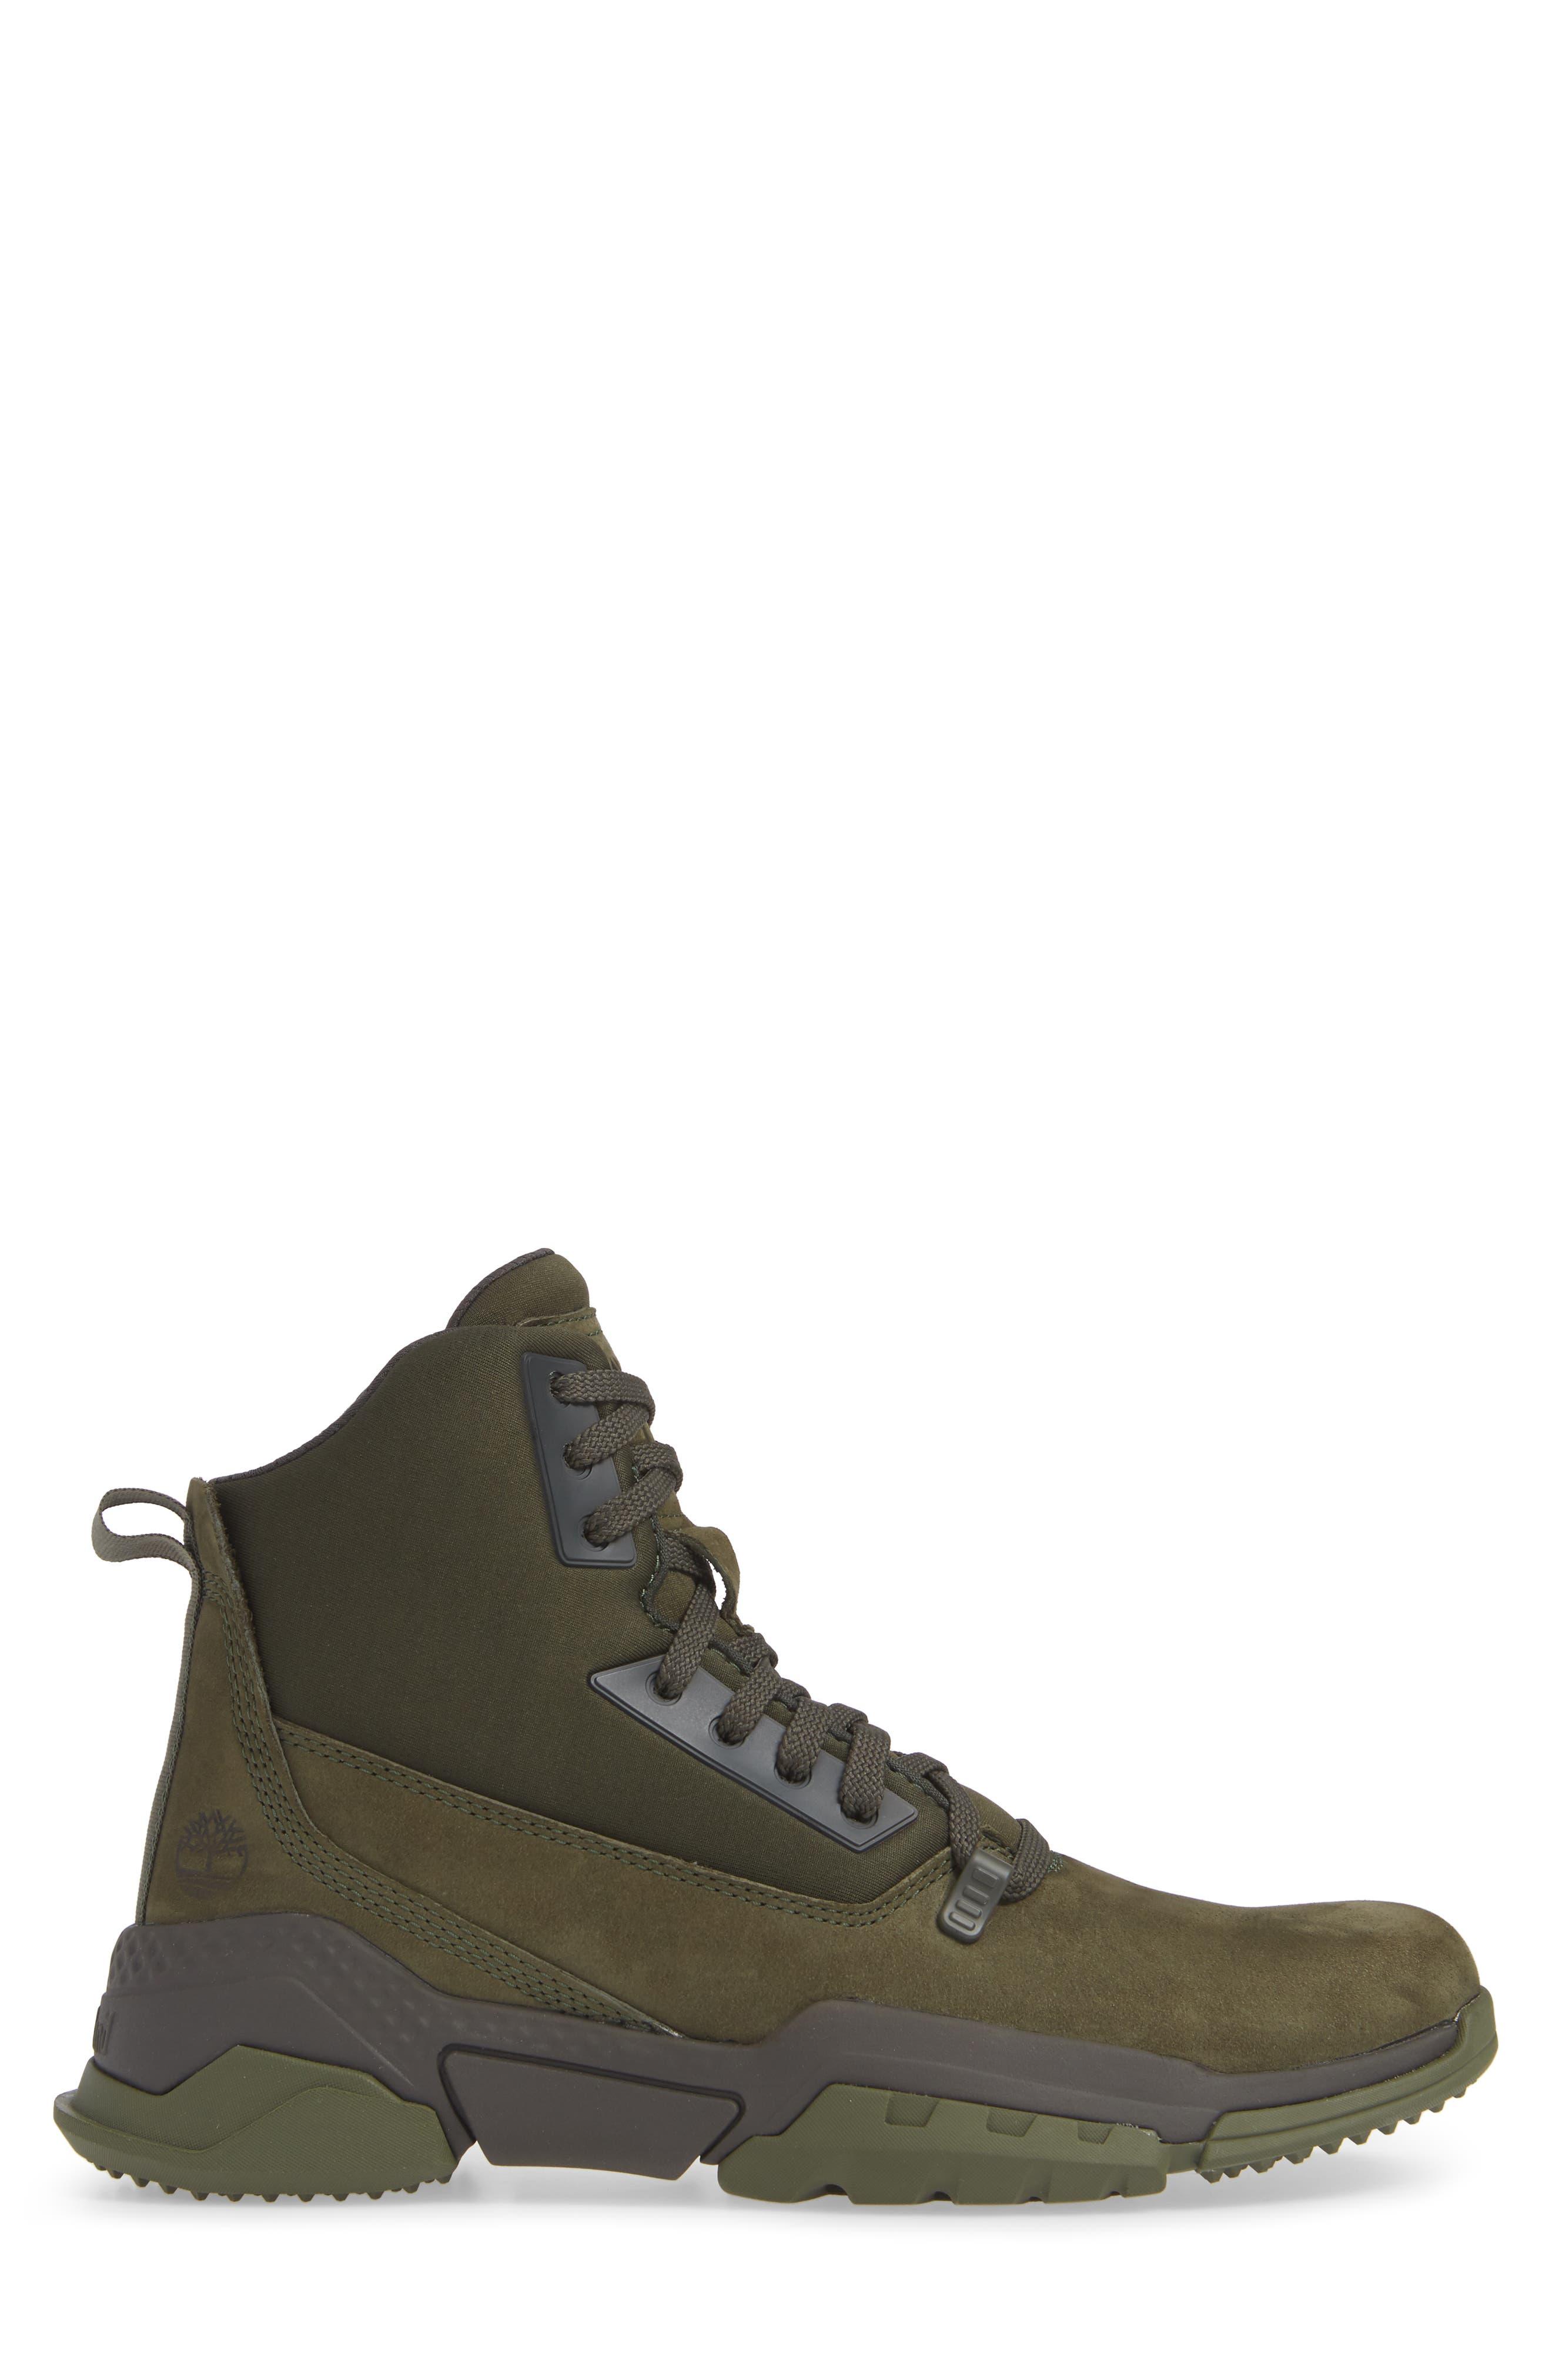 City Force Boot,                             Alternate thumbnail 3, color,                             GRAPE/ GREY NUBUCK